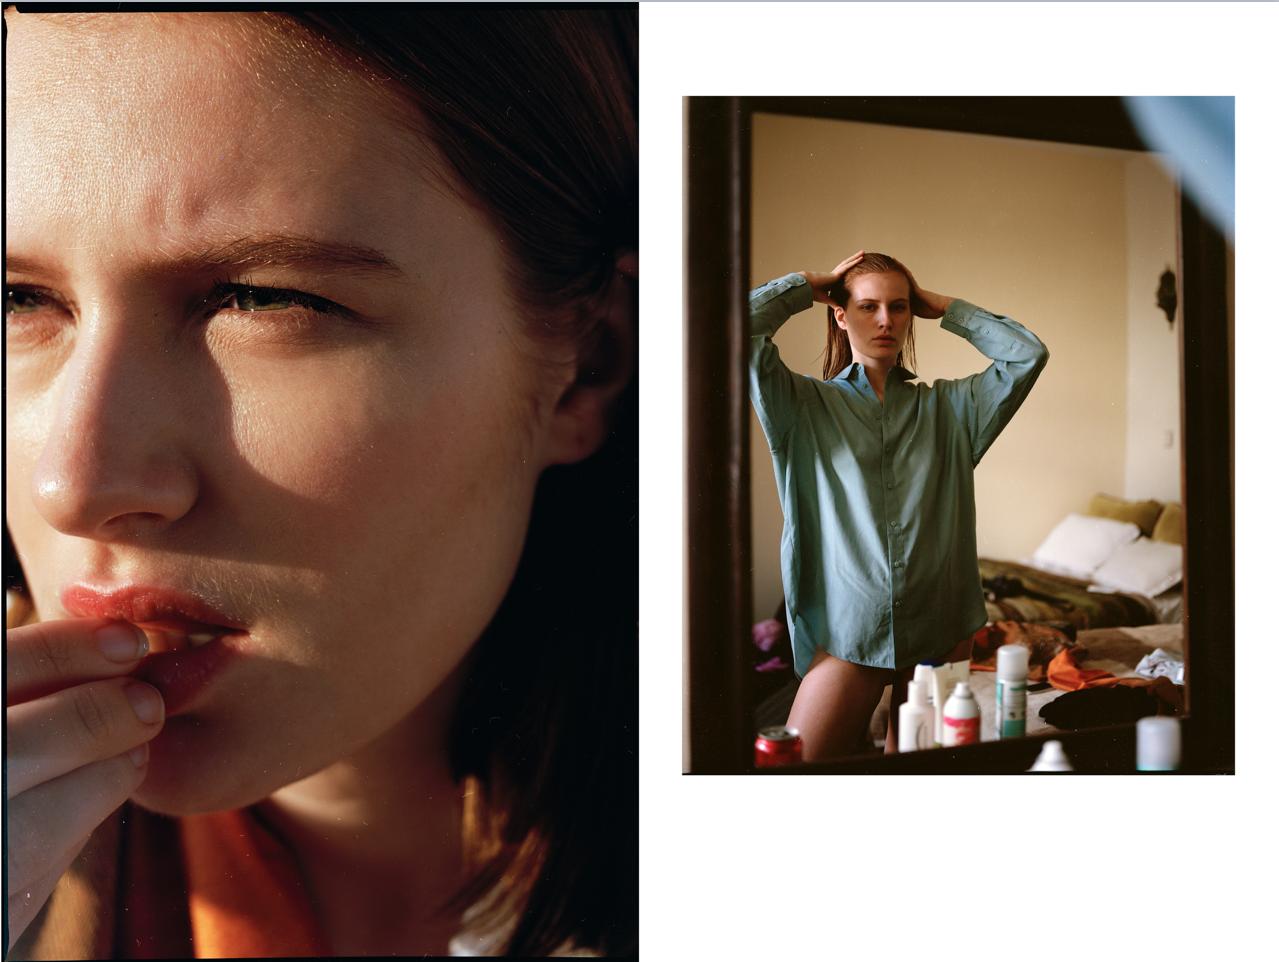 Foto: Markus Nymo Foss. Modell: Karla, Trend Models